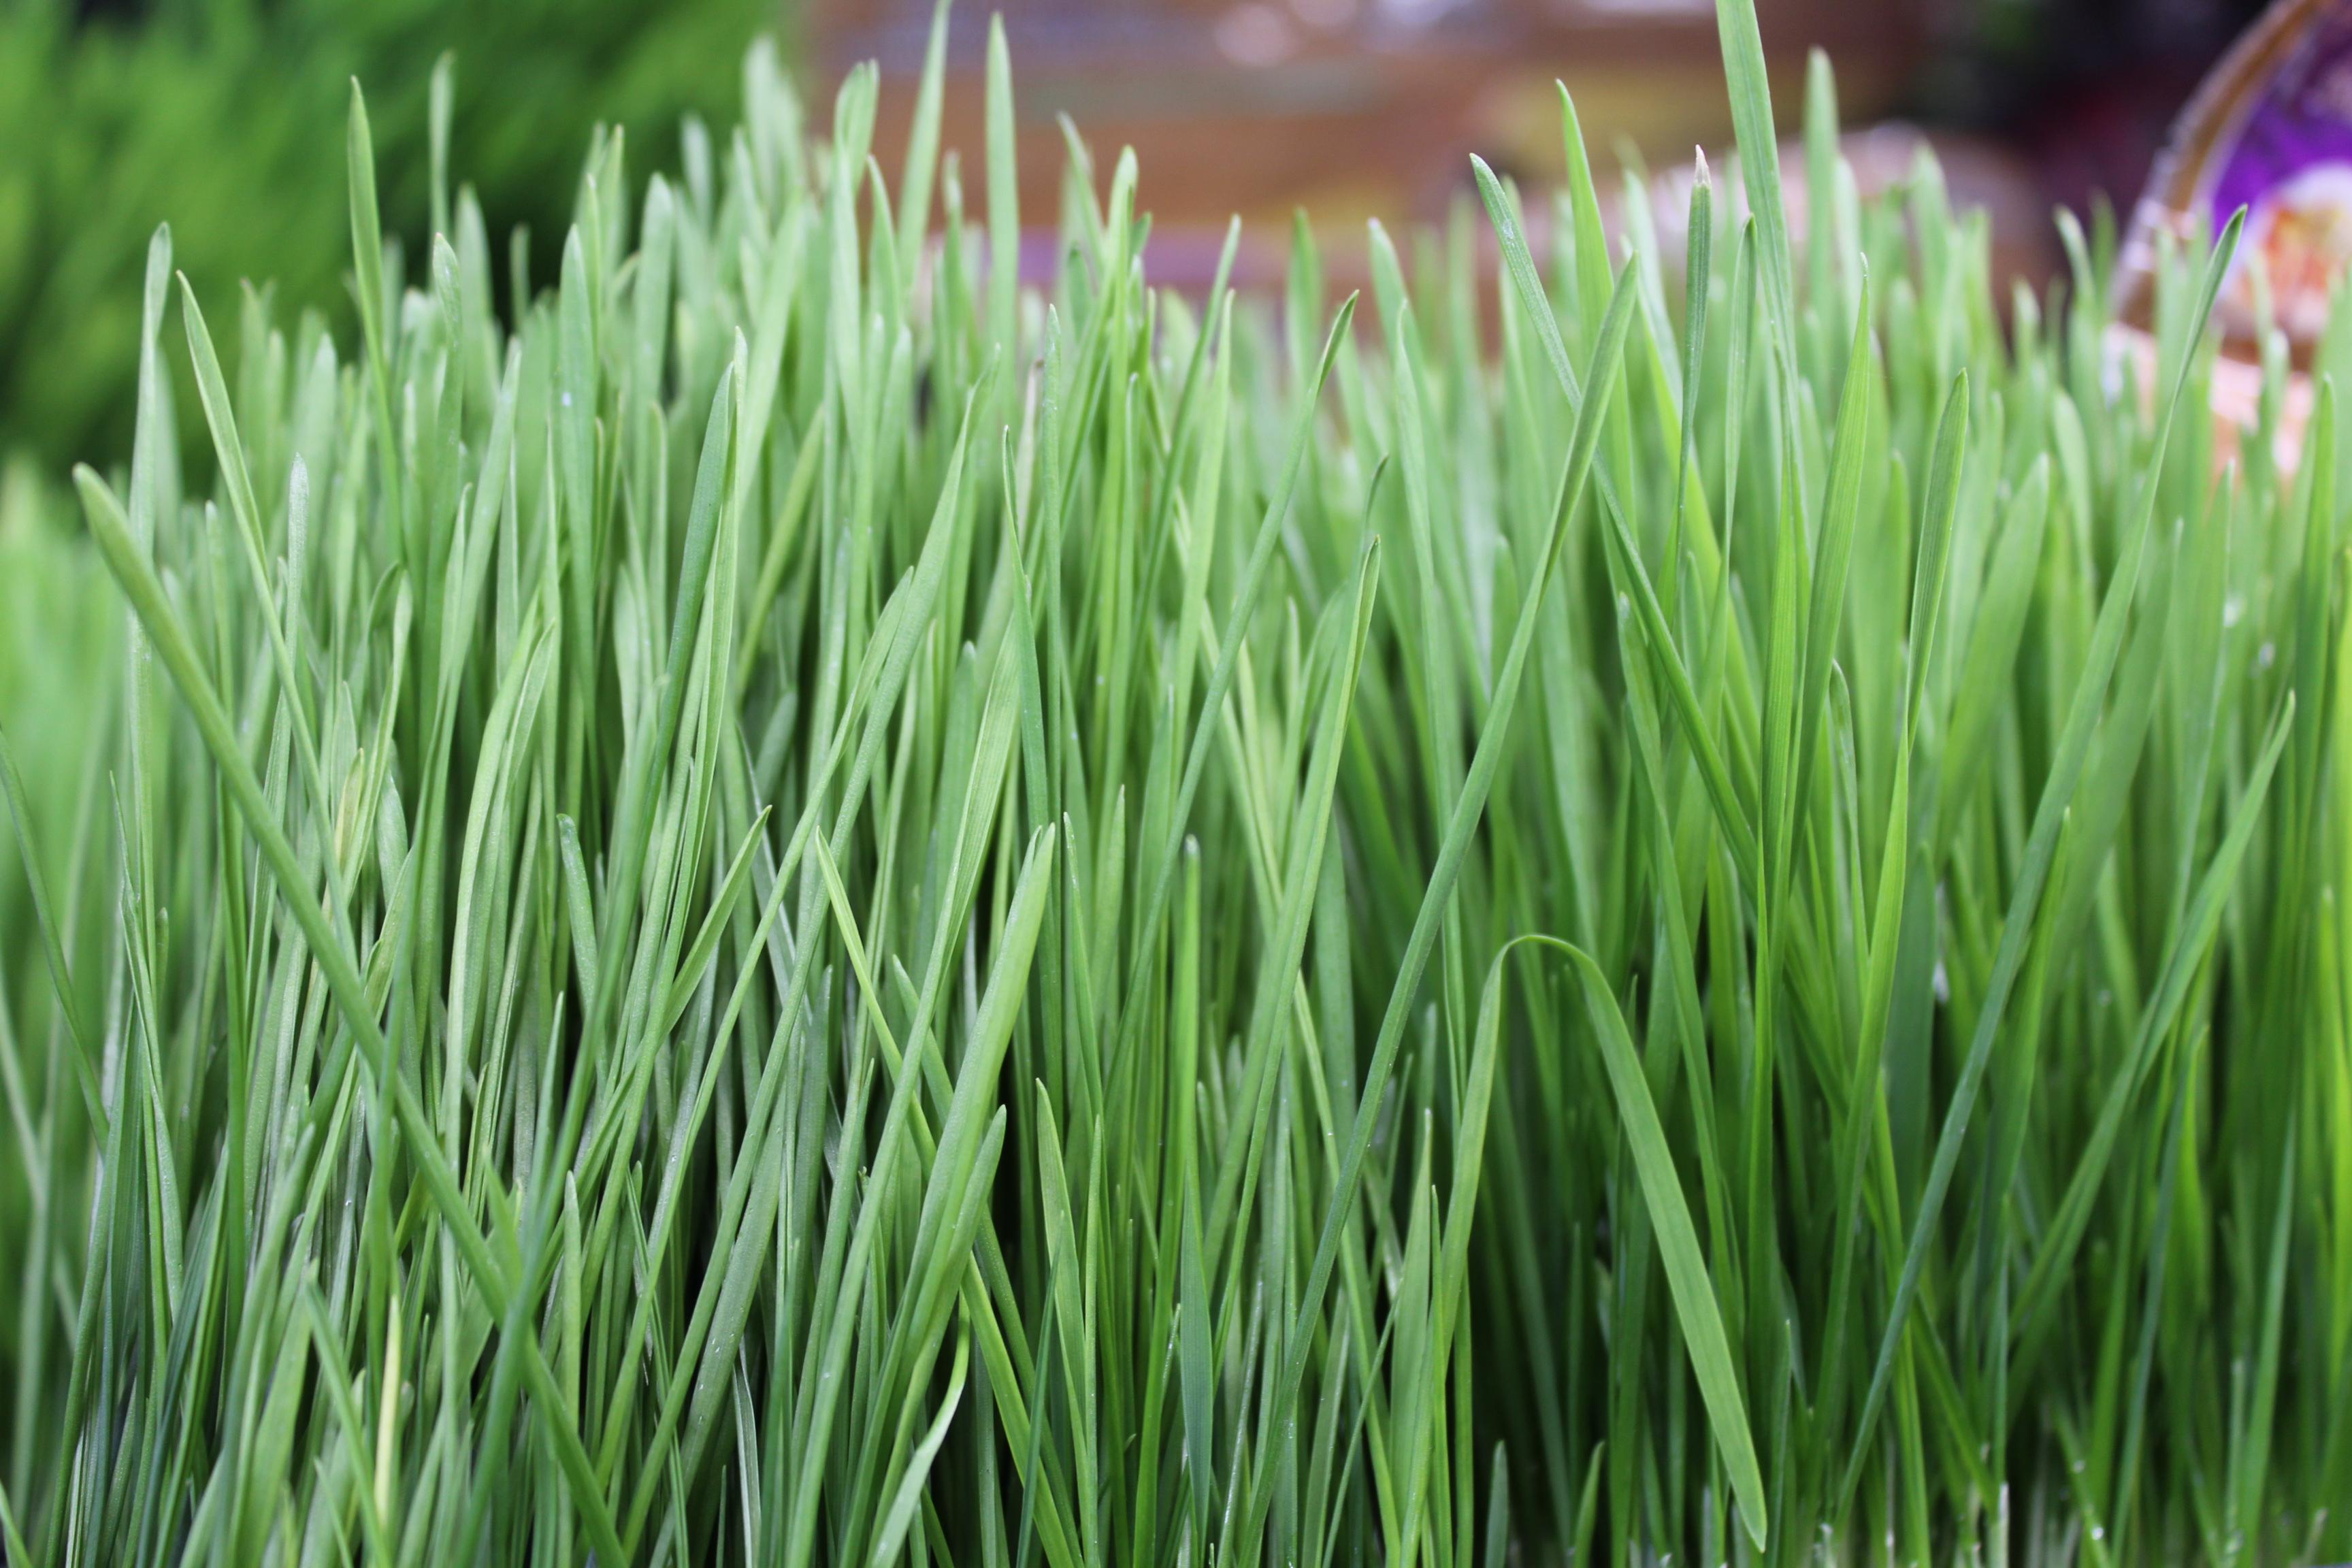 Produce_wheatgrass_IMG_4208